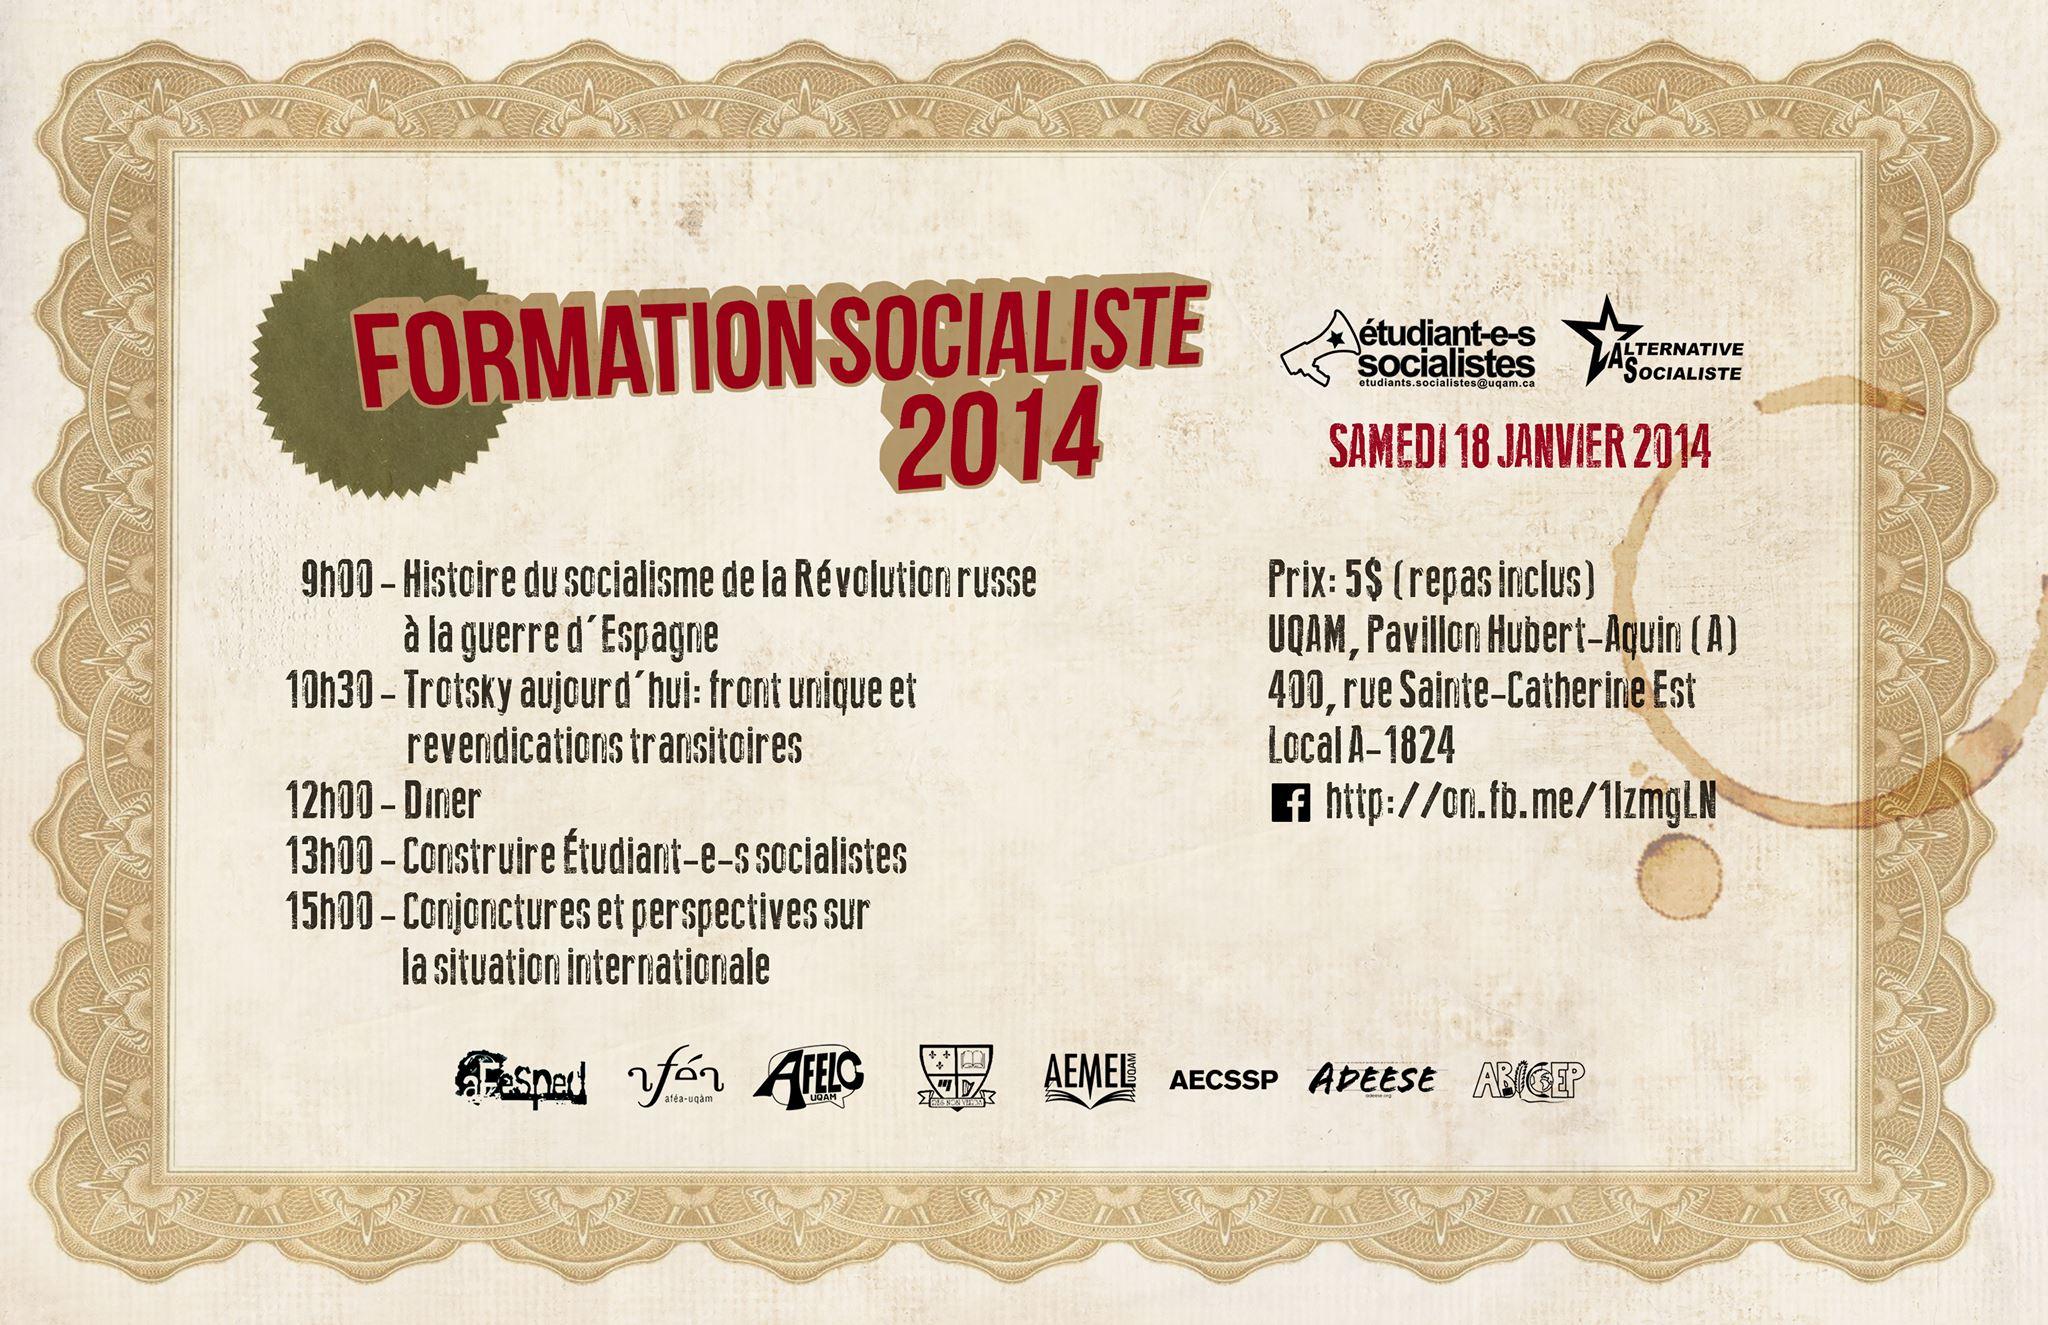 Affiche Formation socialiste 2014